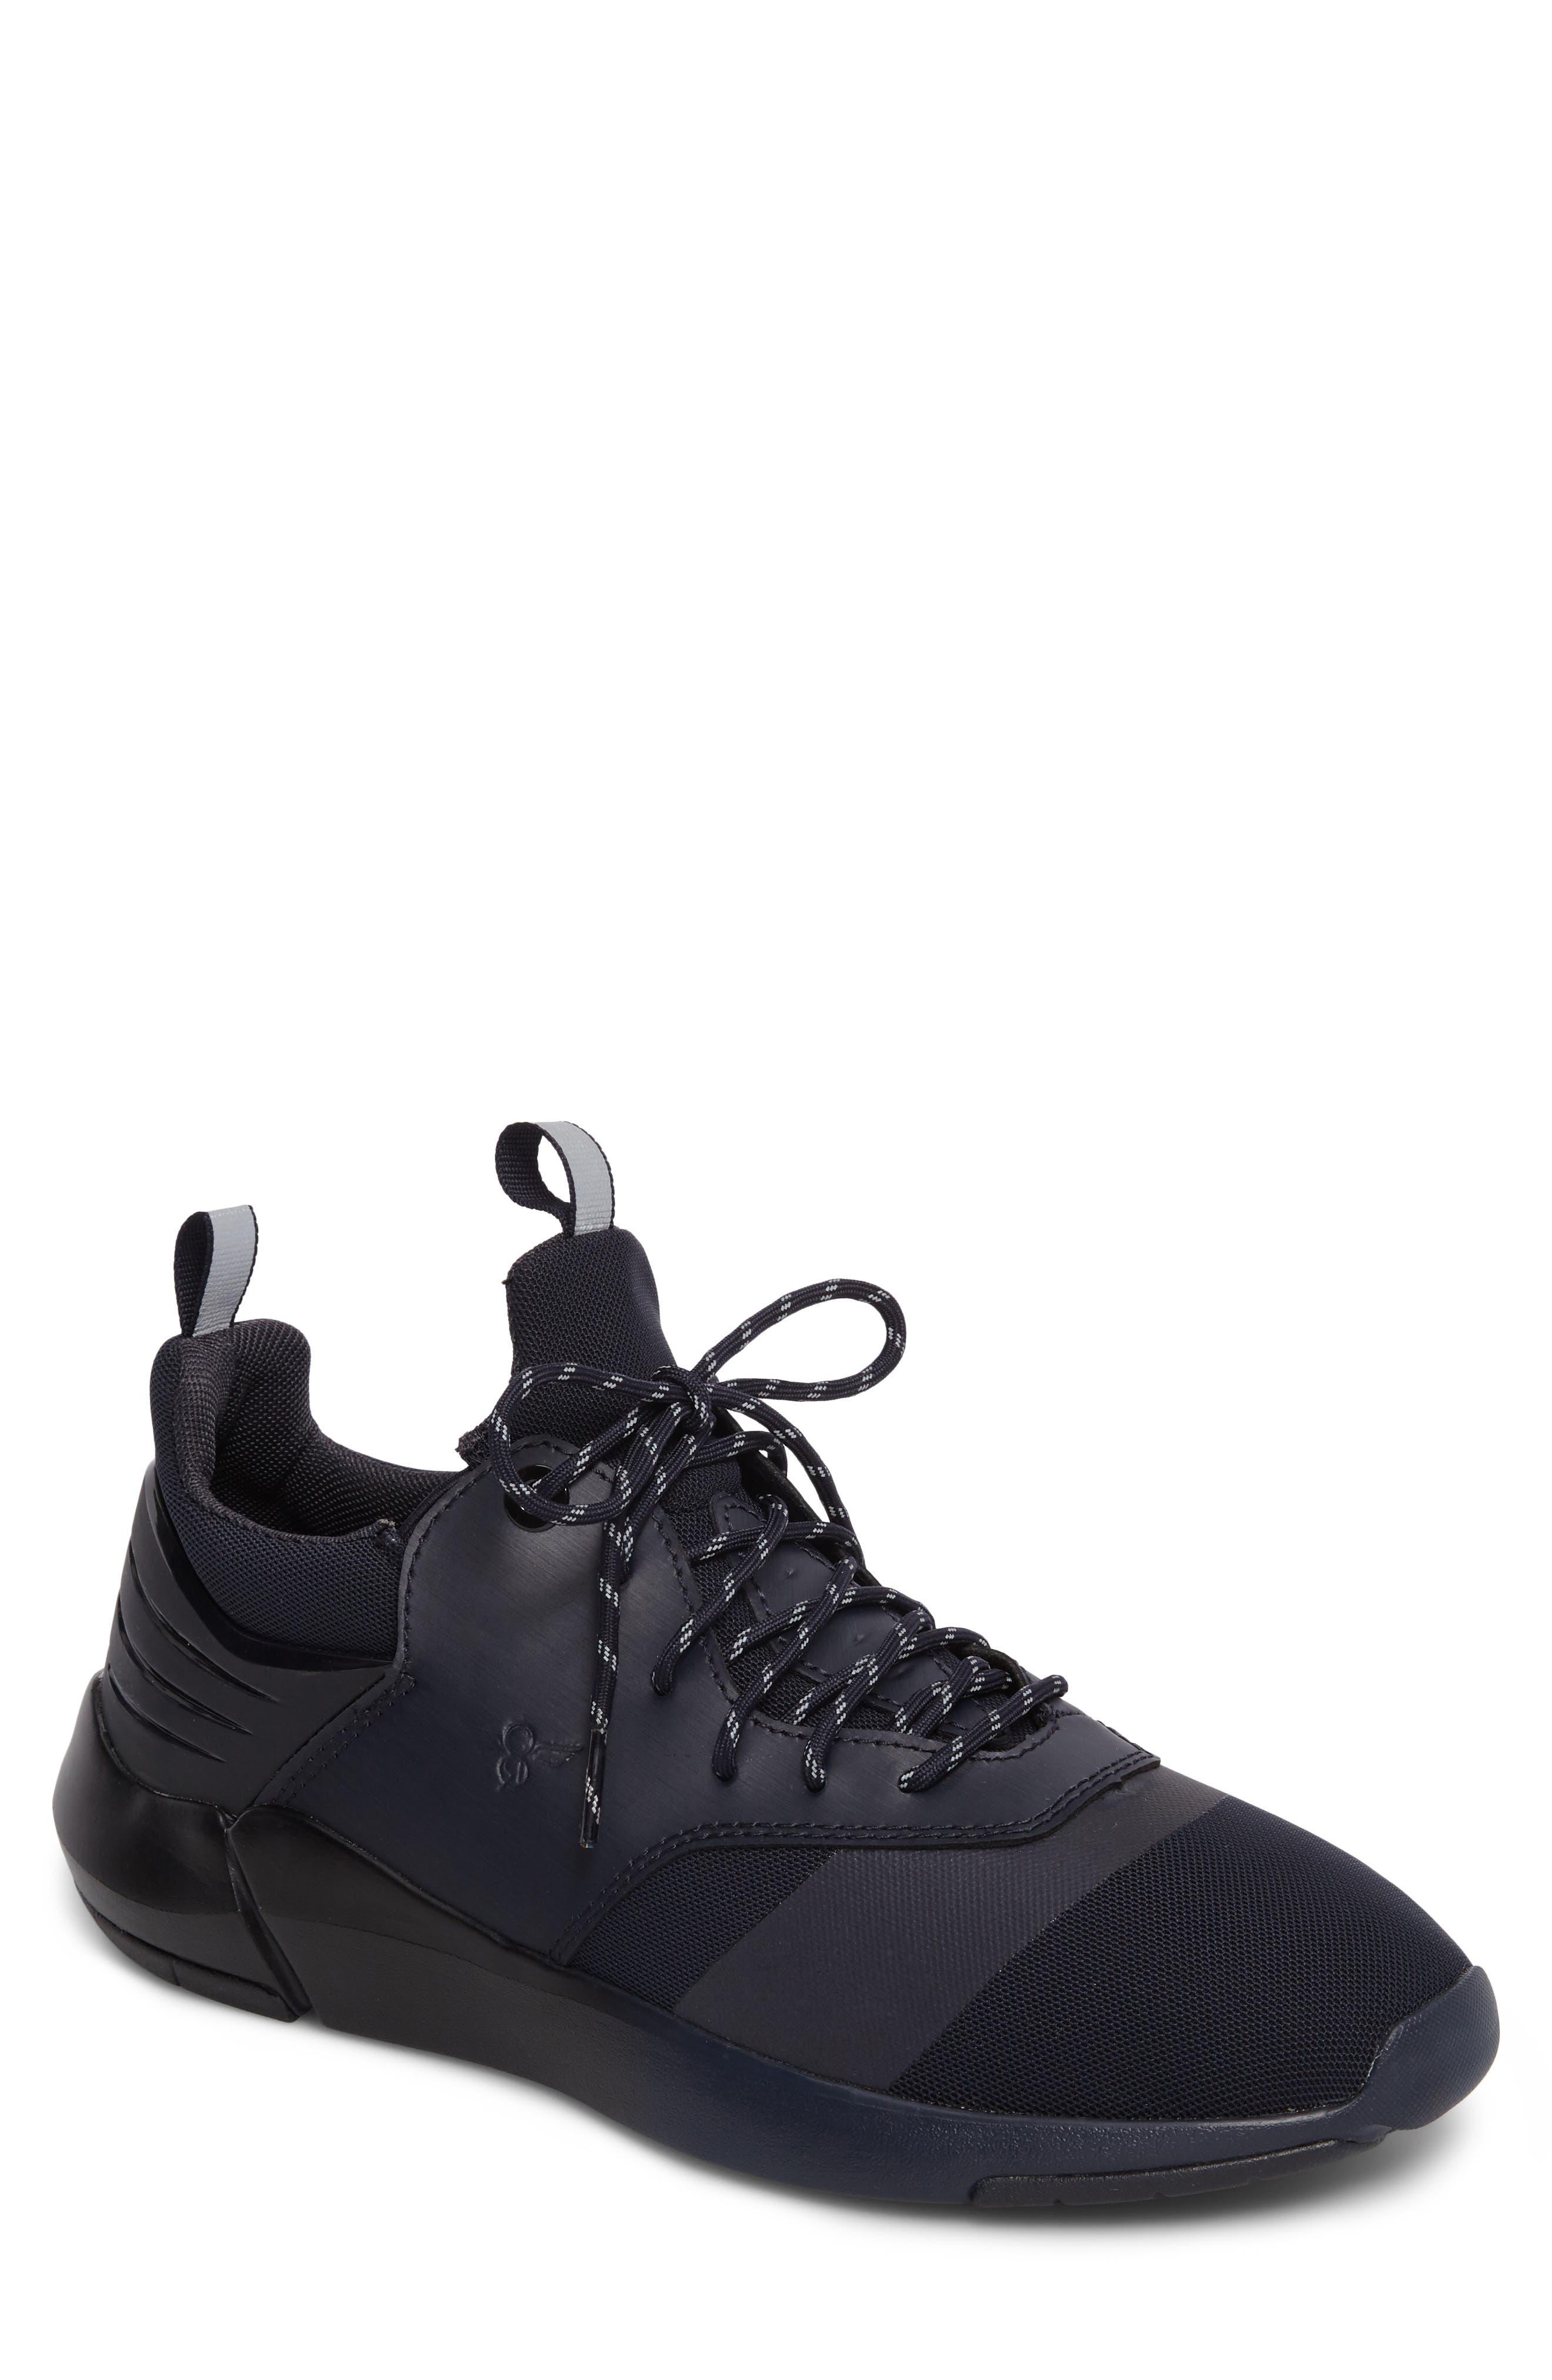 Motus Sneaker,                             Main thumbnail 1, color,                             Navy Reflective Leather